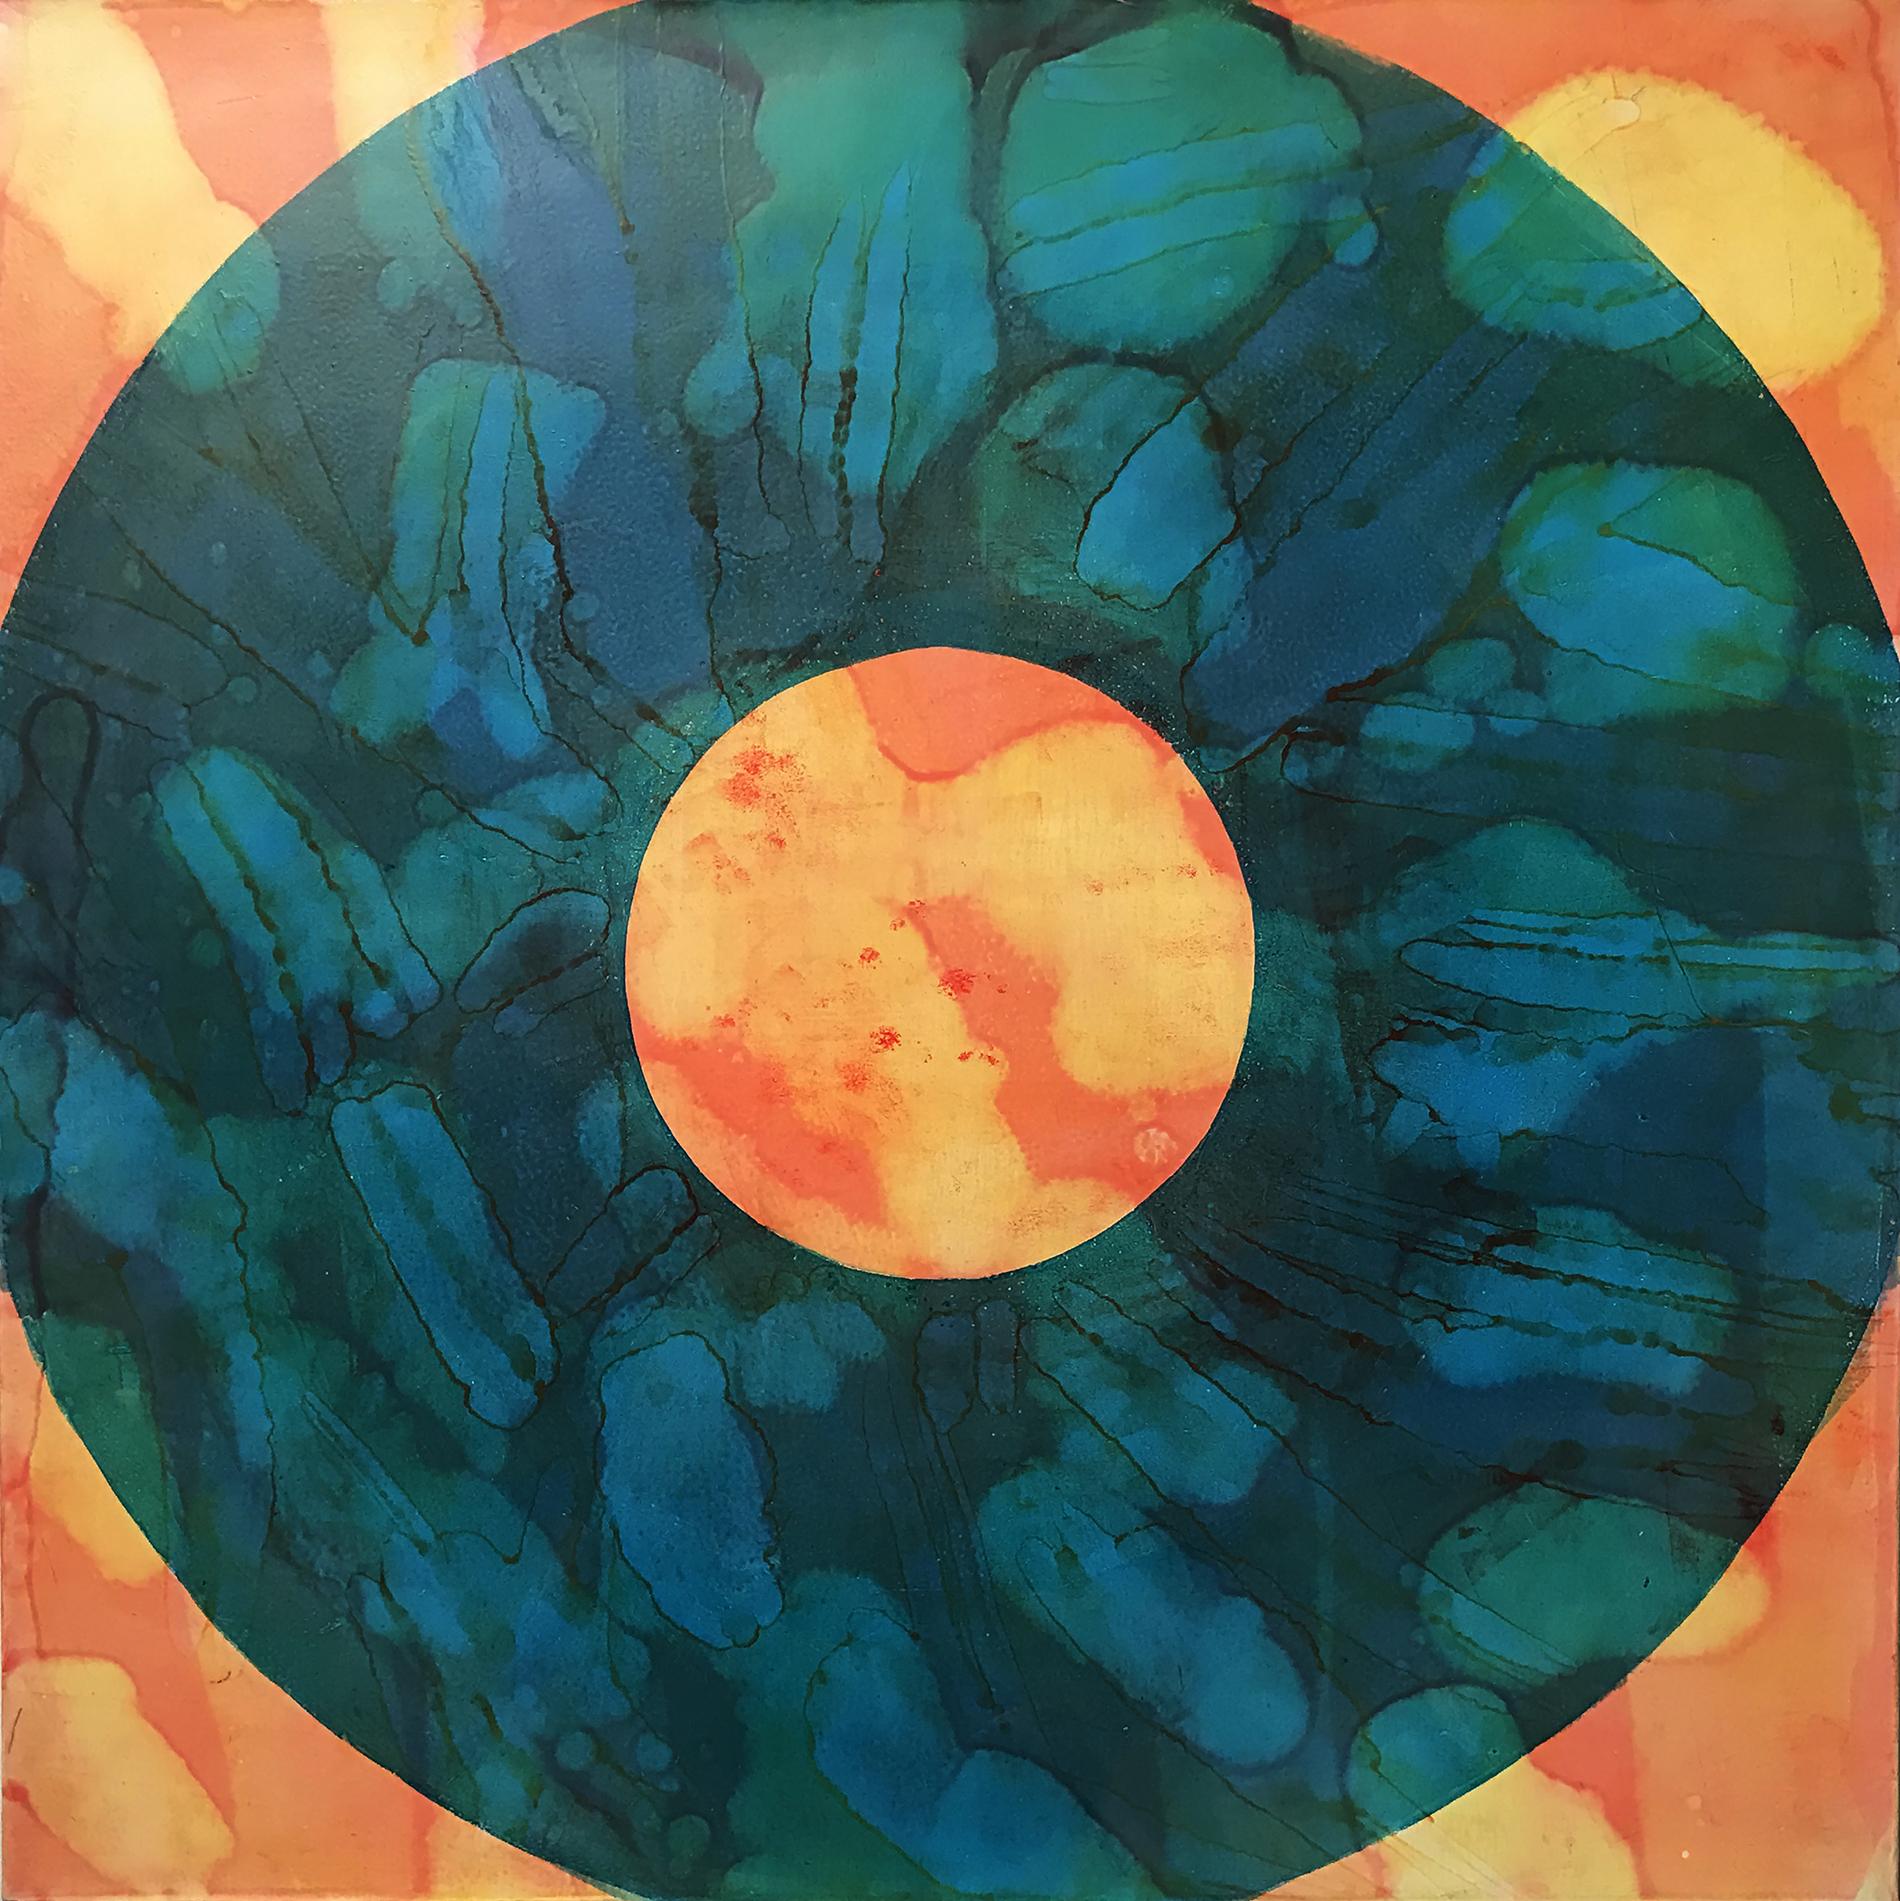 KODAK 2015 Oil on canvas 24 x 24 inches